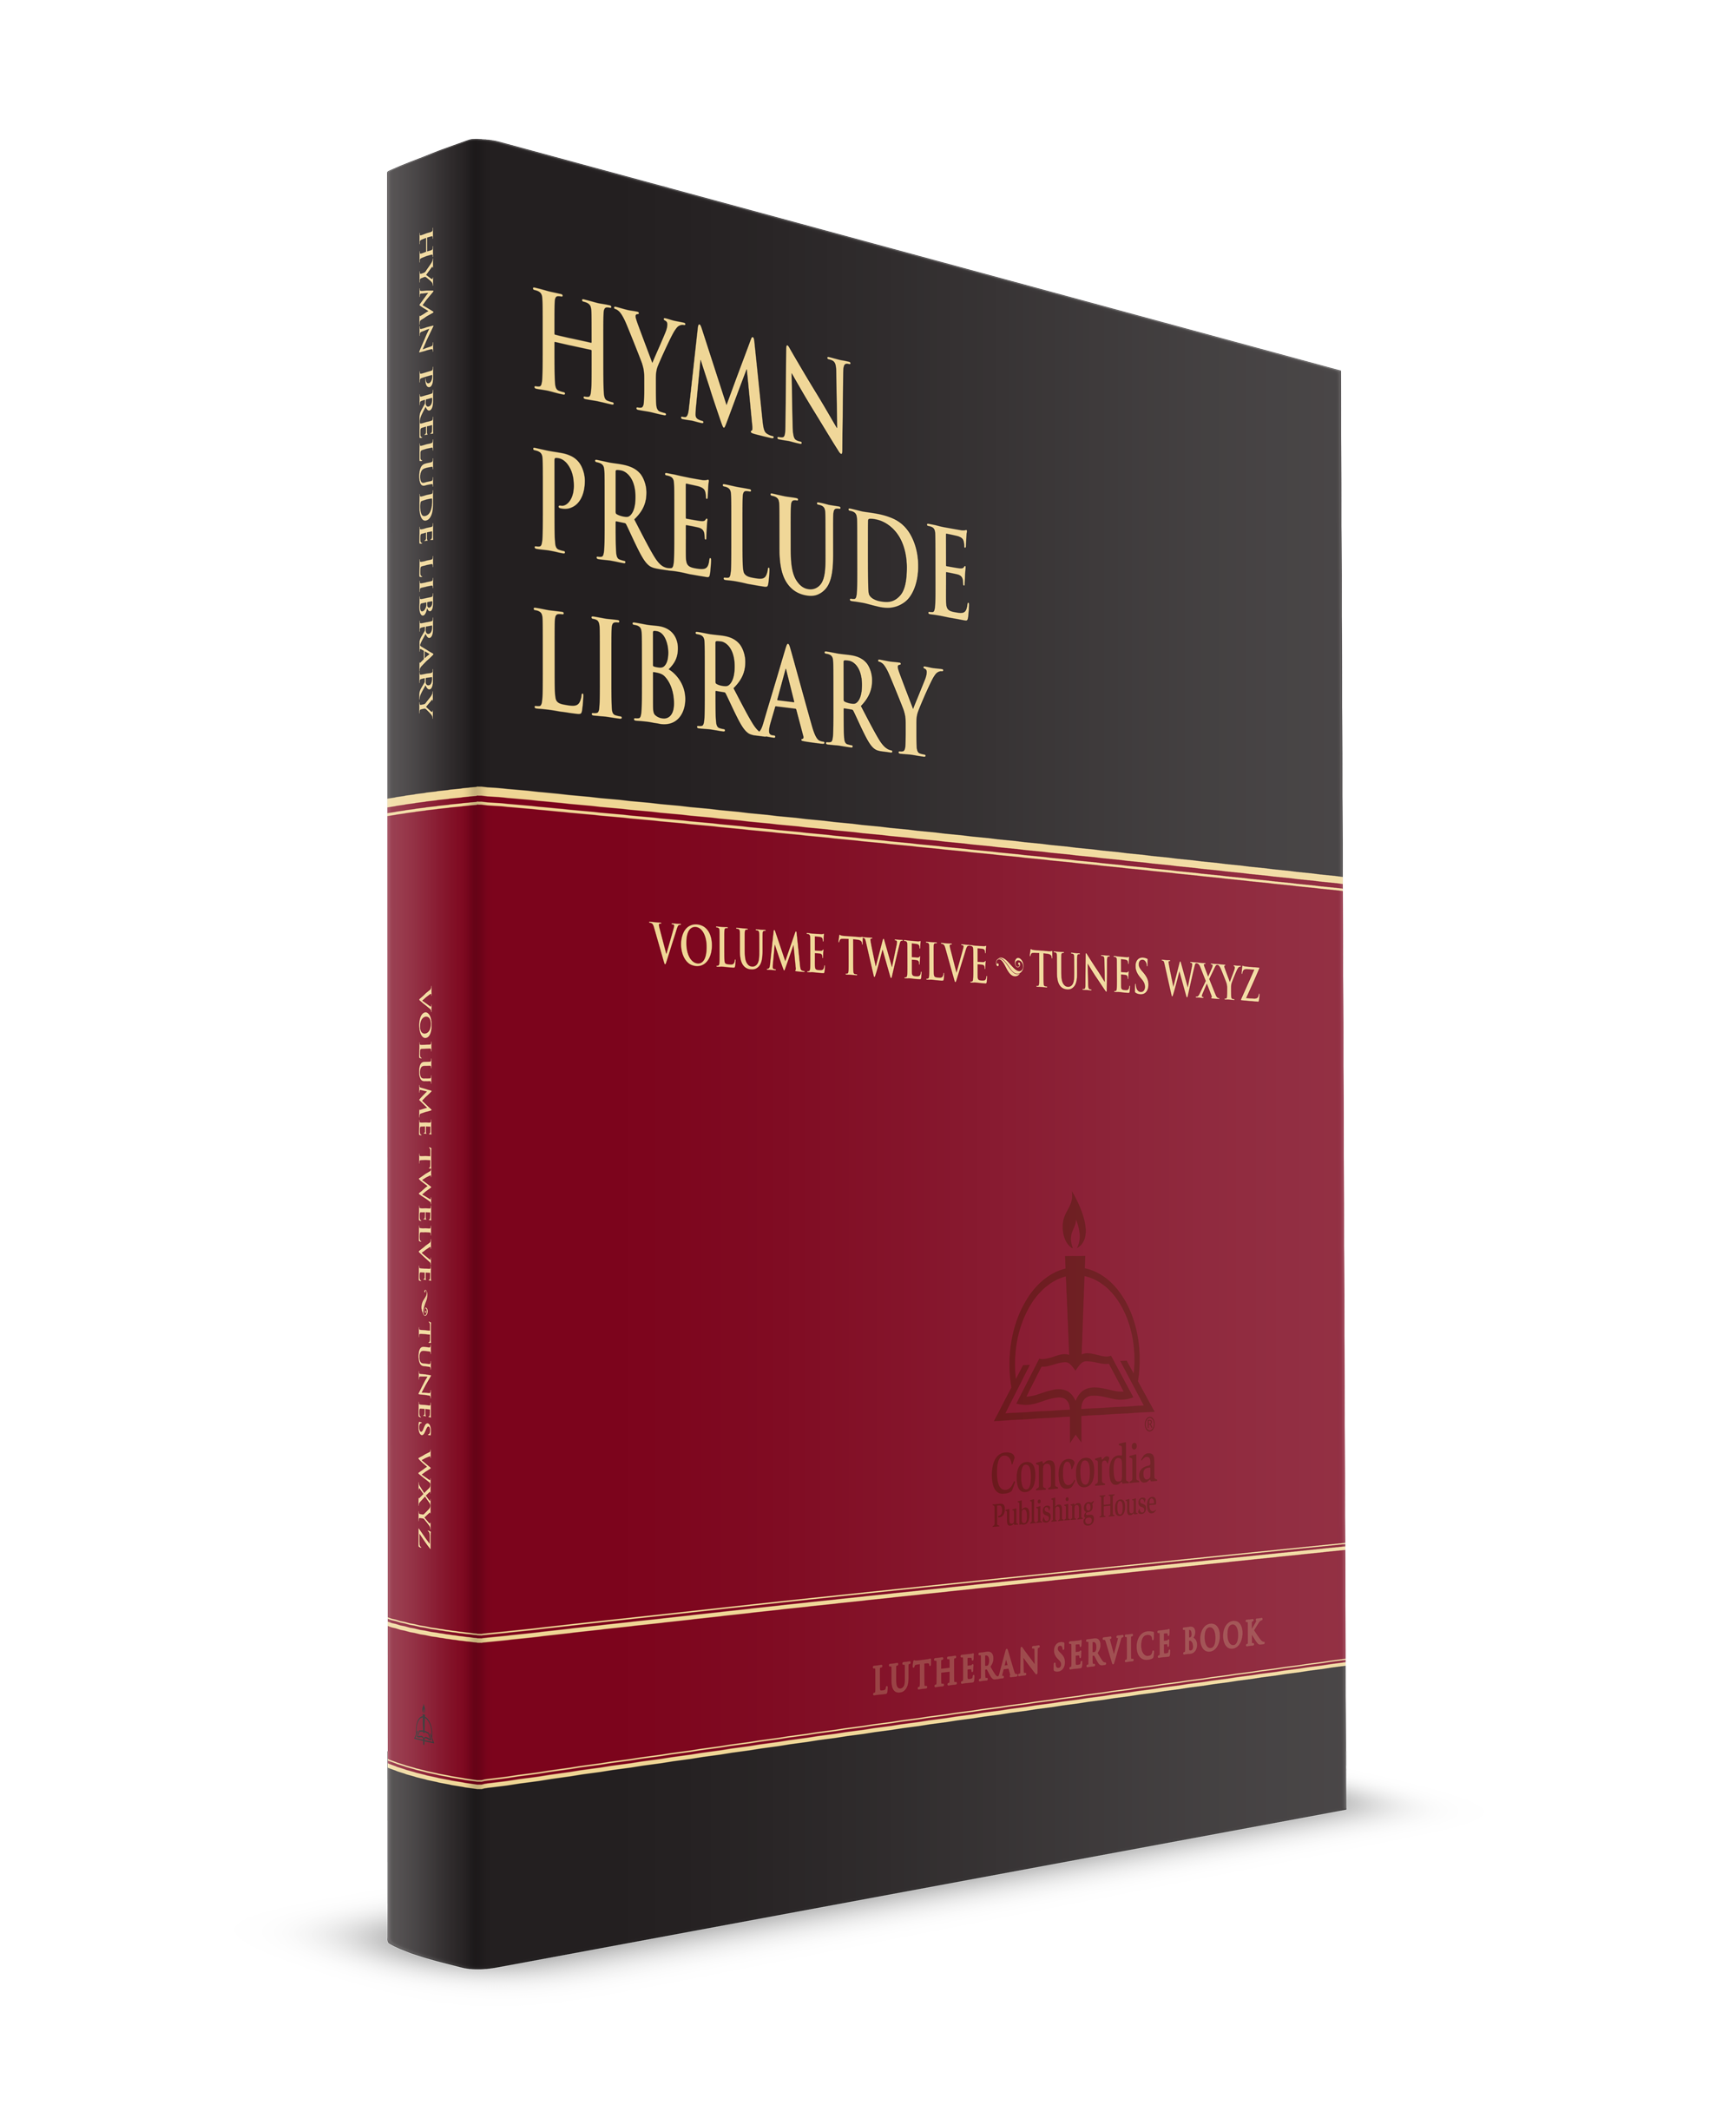 hymn-prelude-12.png